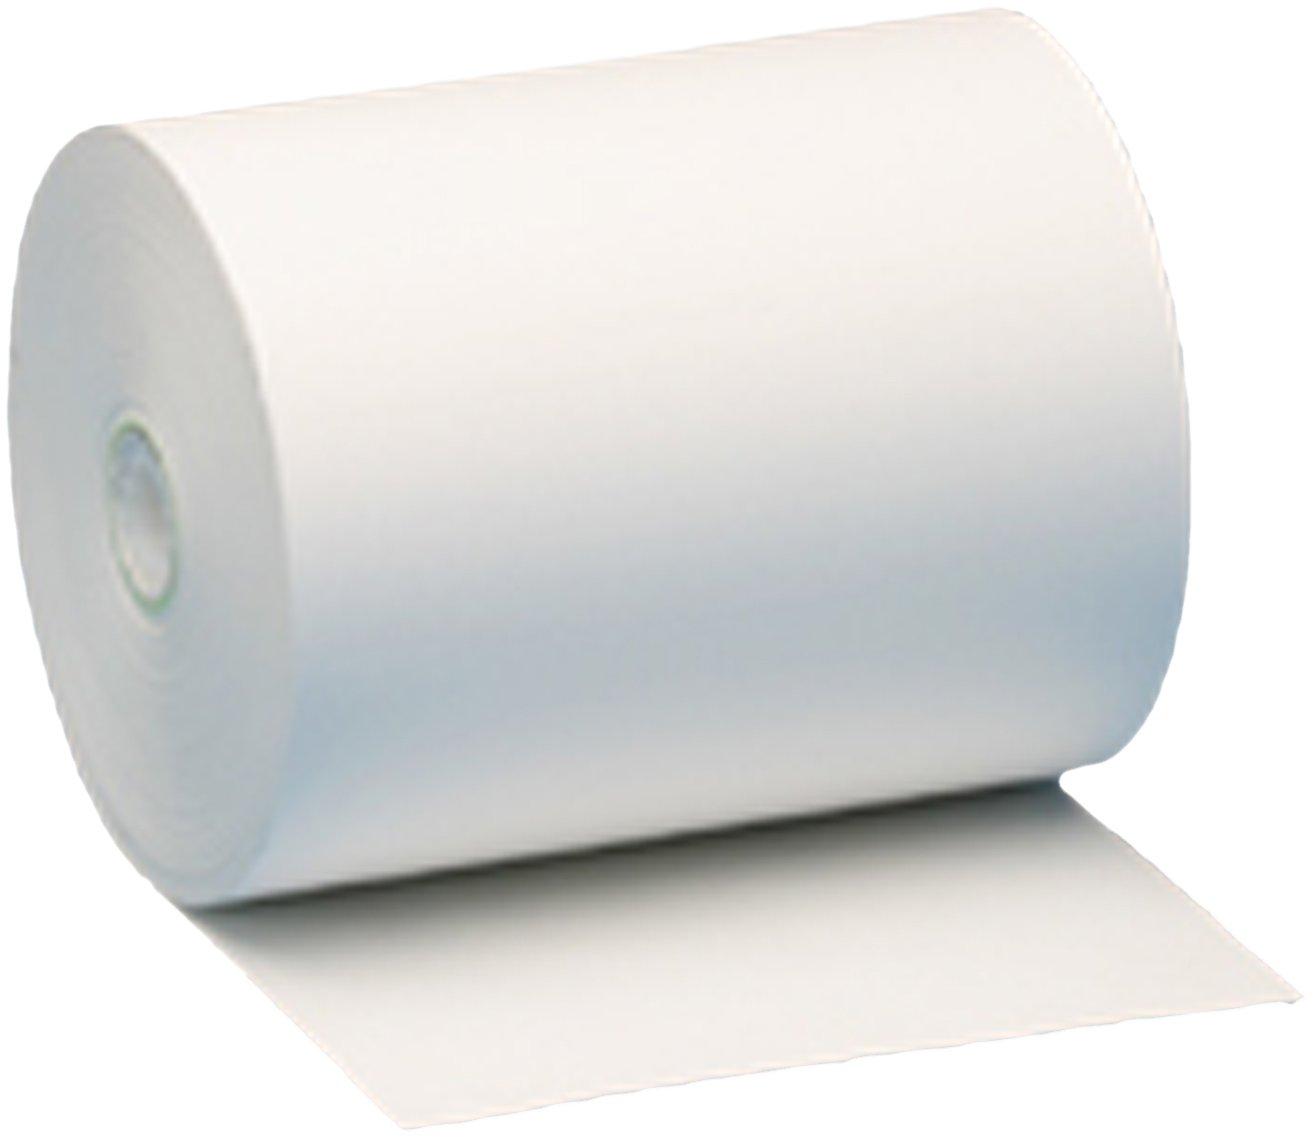 Nashua 4-3/8'' x 328' Thermal Cash Register Receipt Paper, standard 48-gram, 24 Rolls